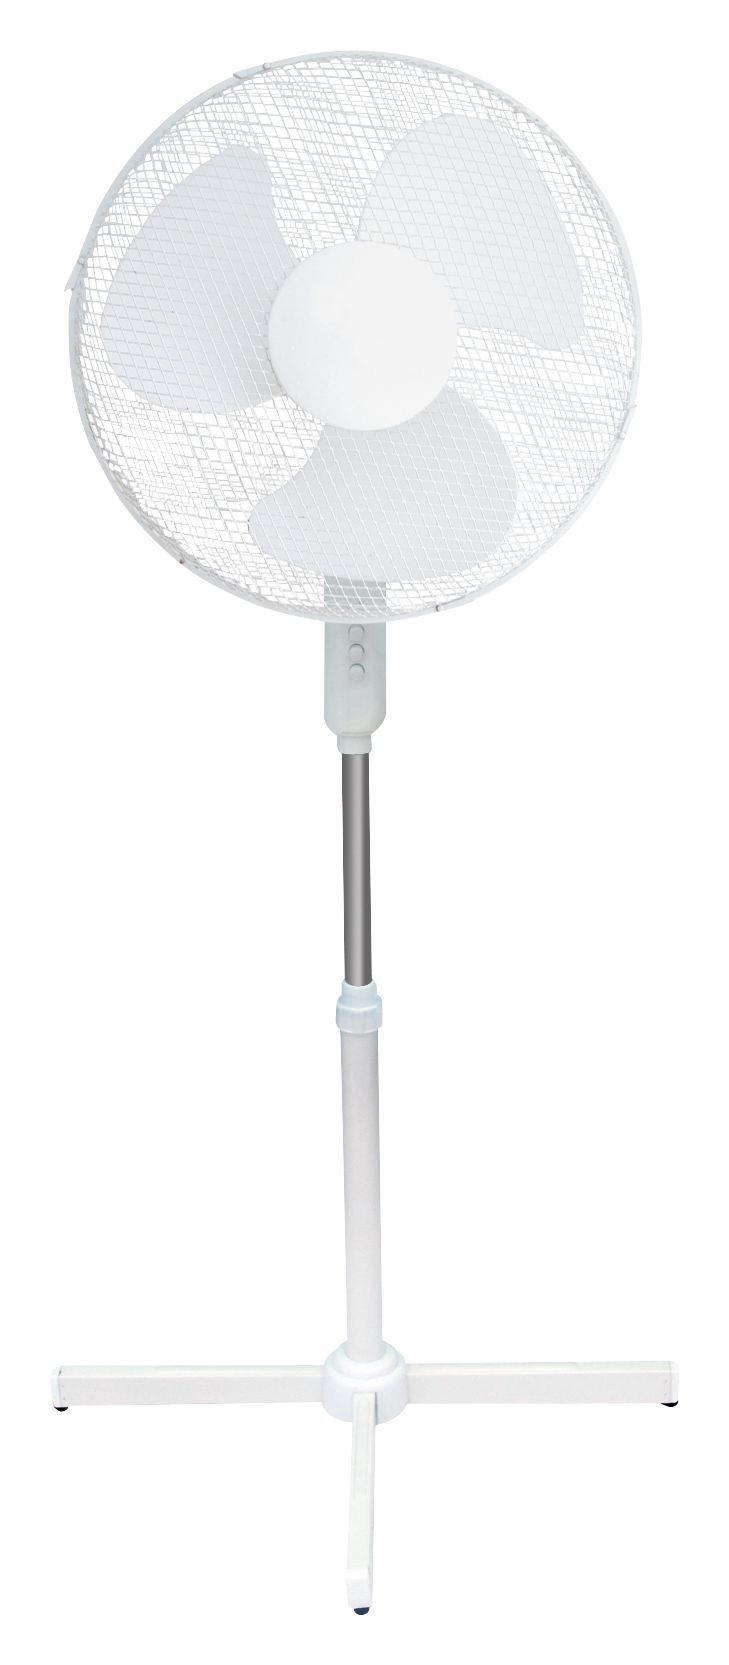 GOLVFLÄKT - vit, Basics, metall/plast (60/60/120cm) - HOMEWARE